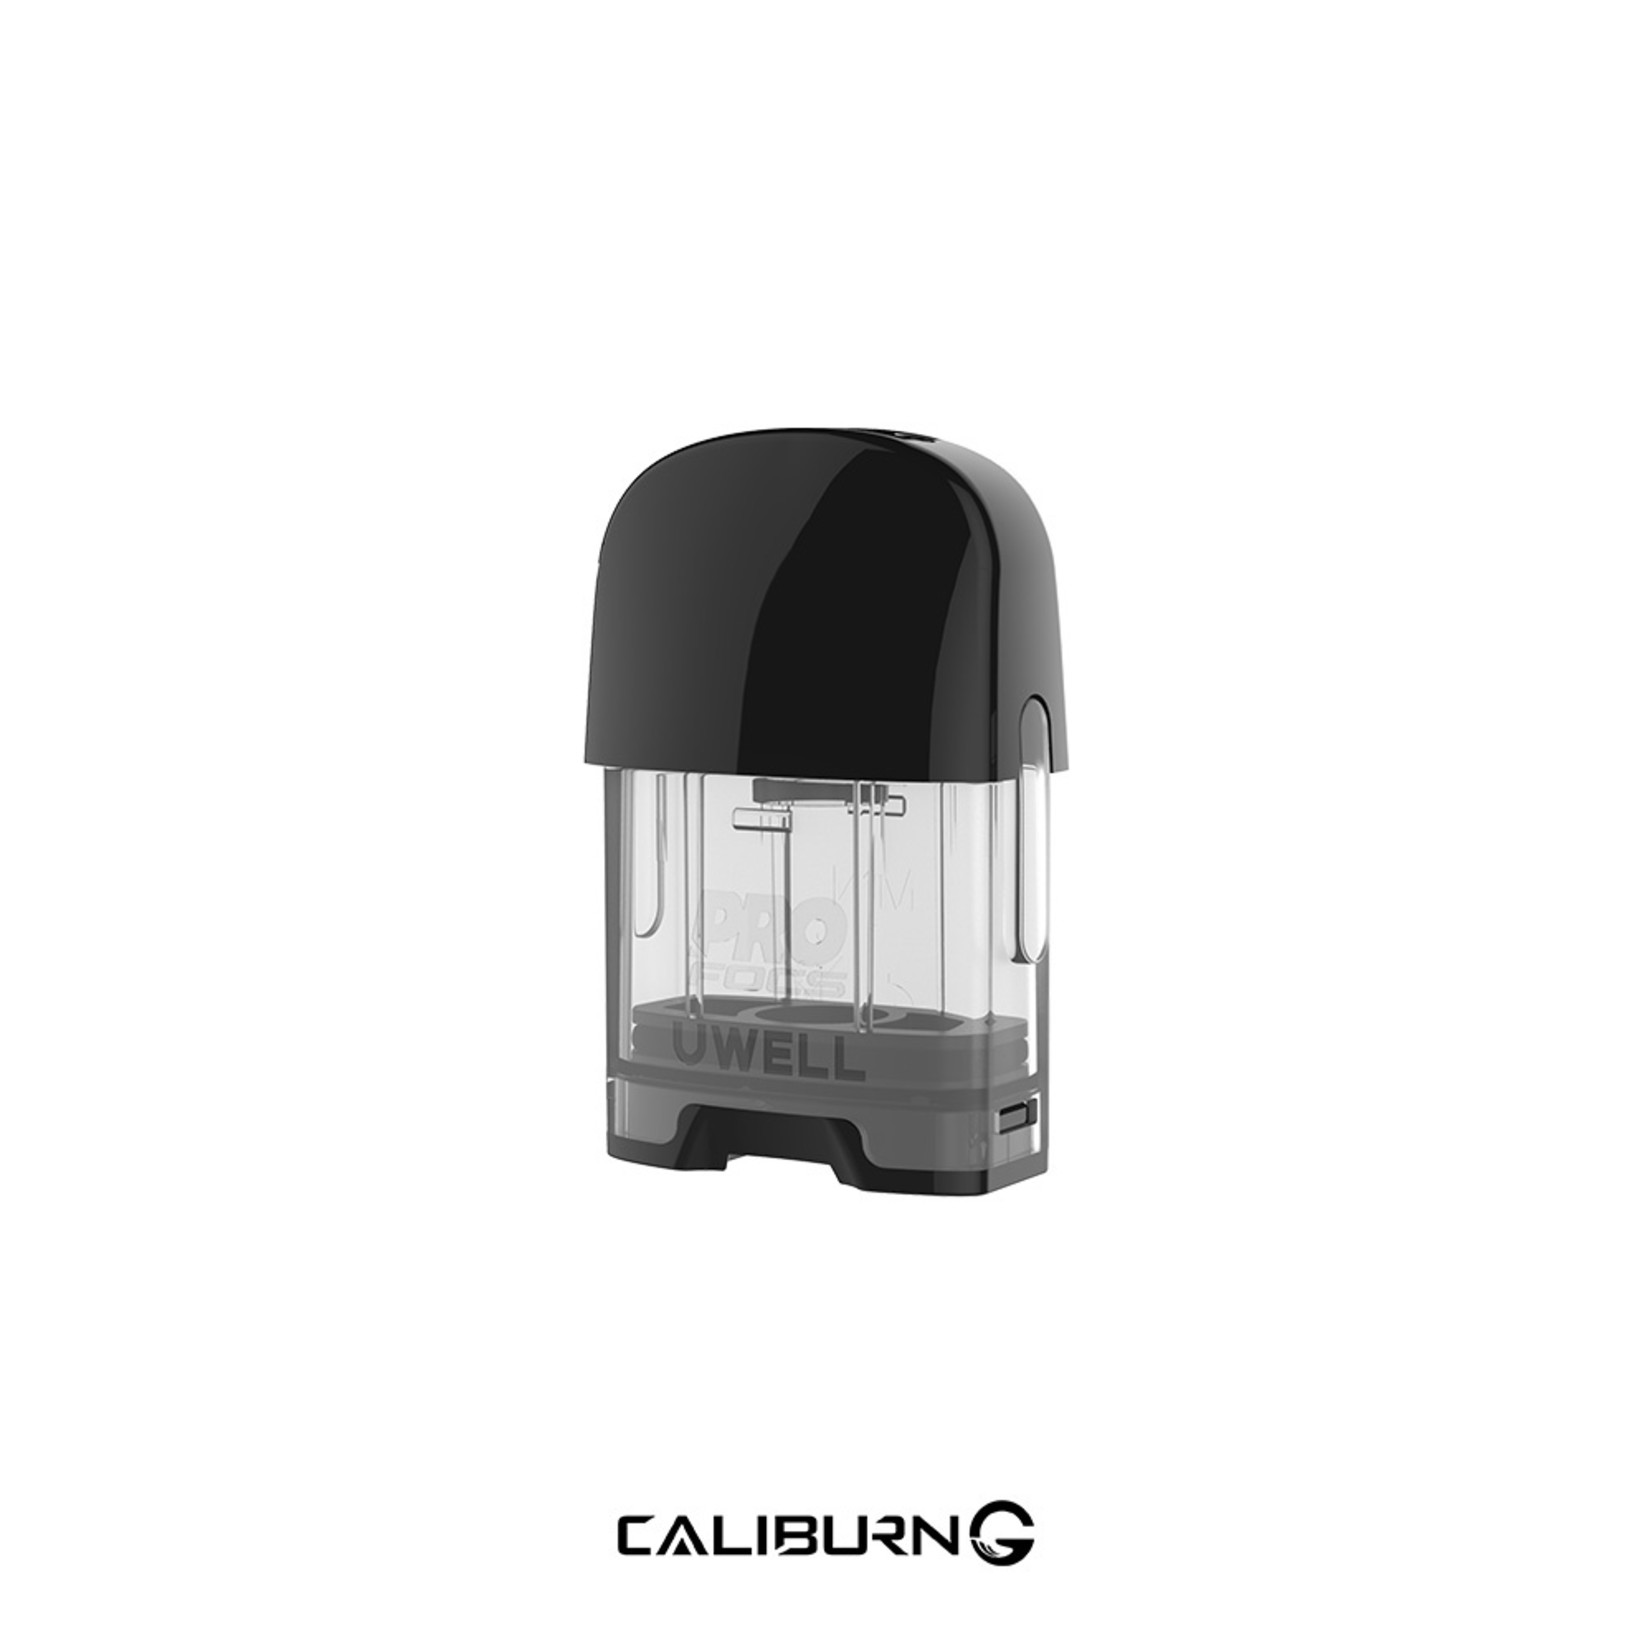 Uwell Caliburn G Replacement Pod